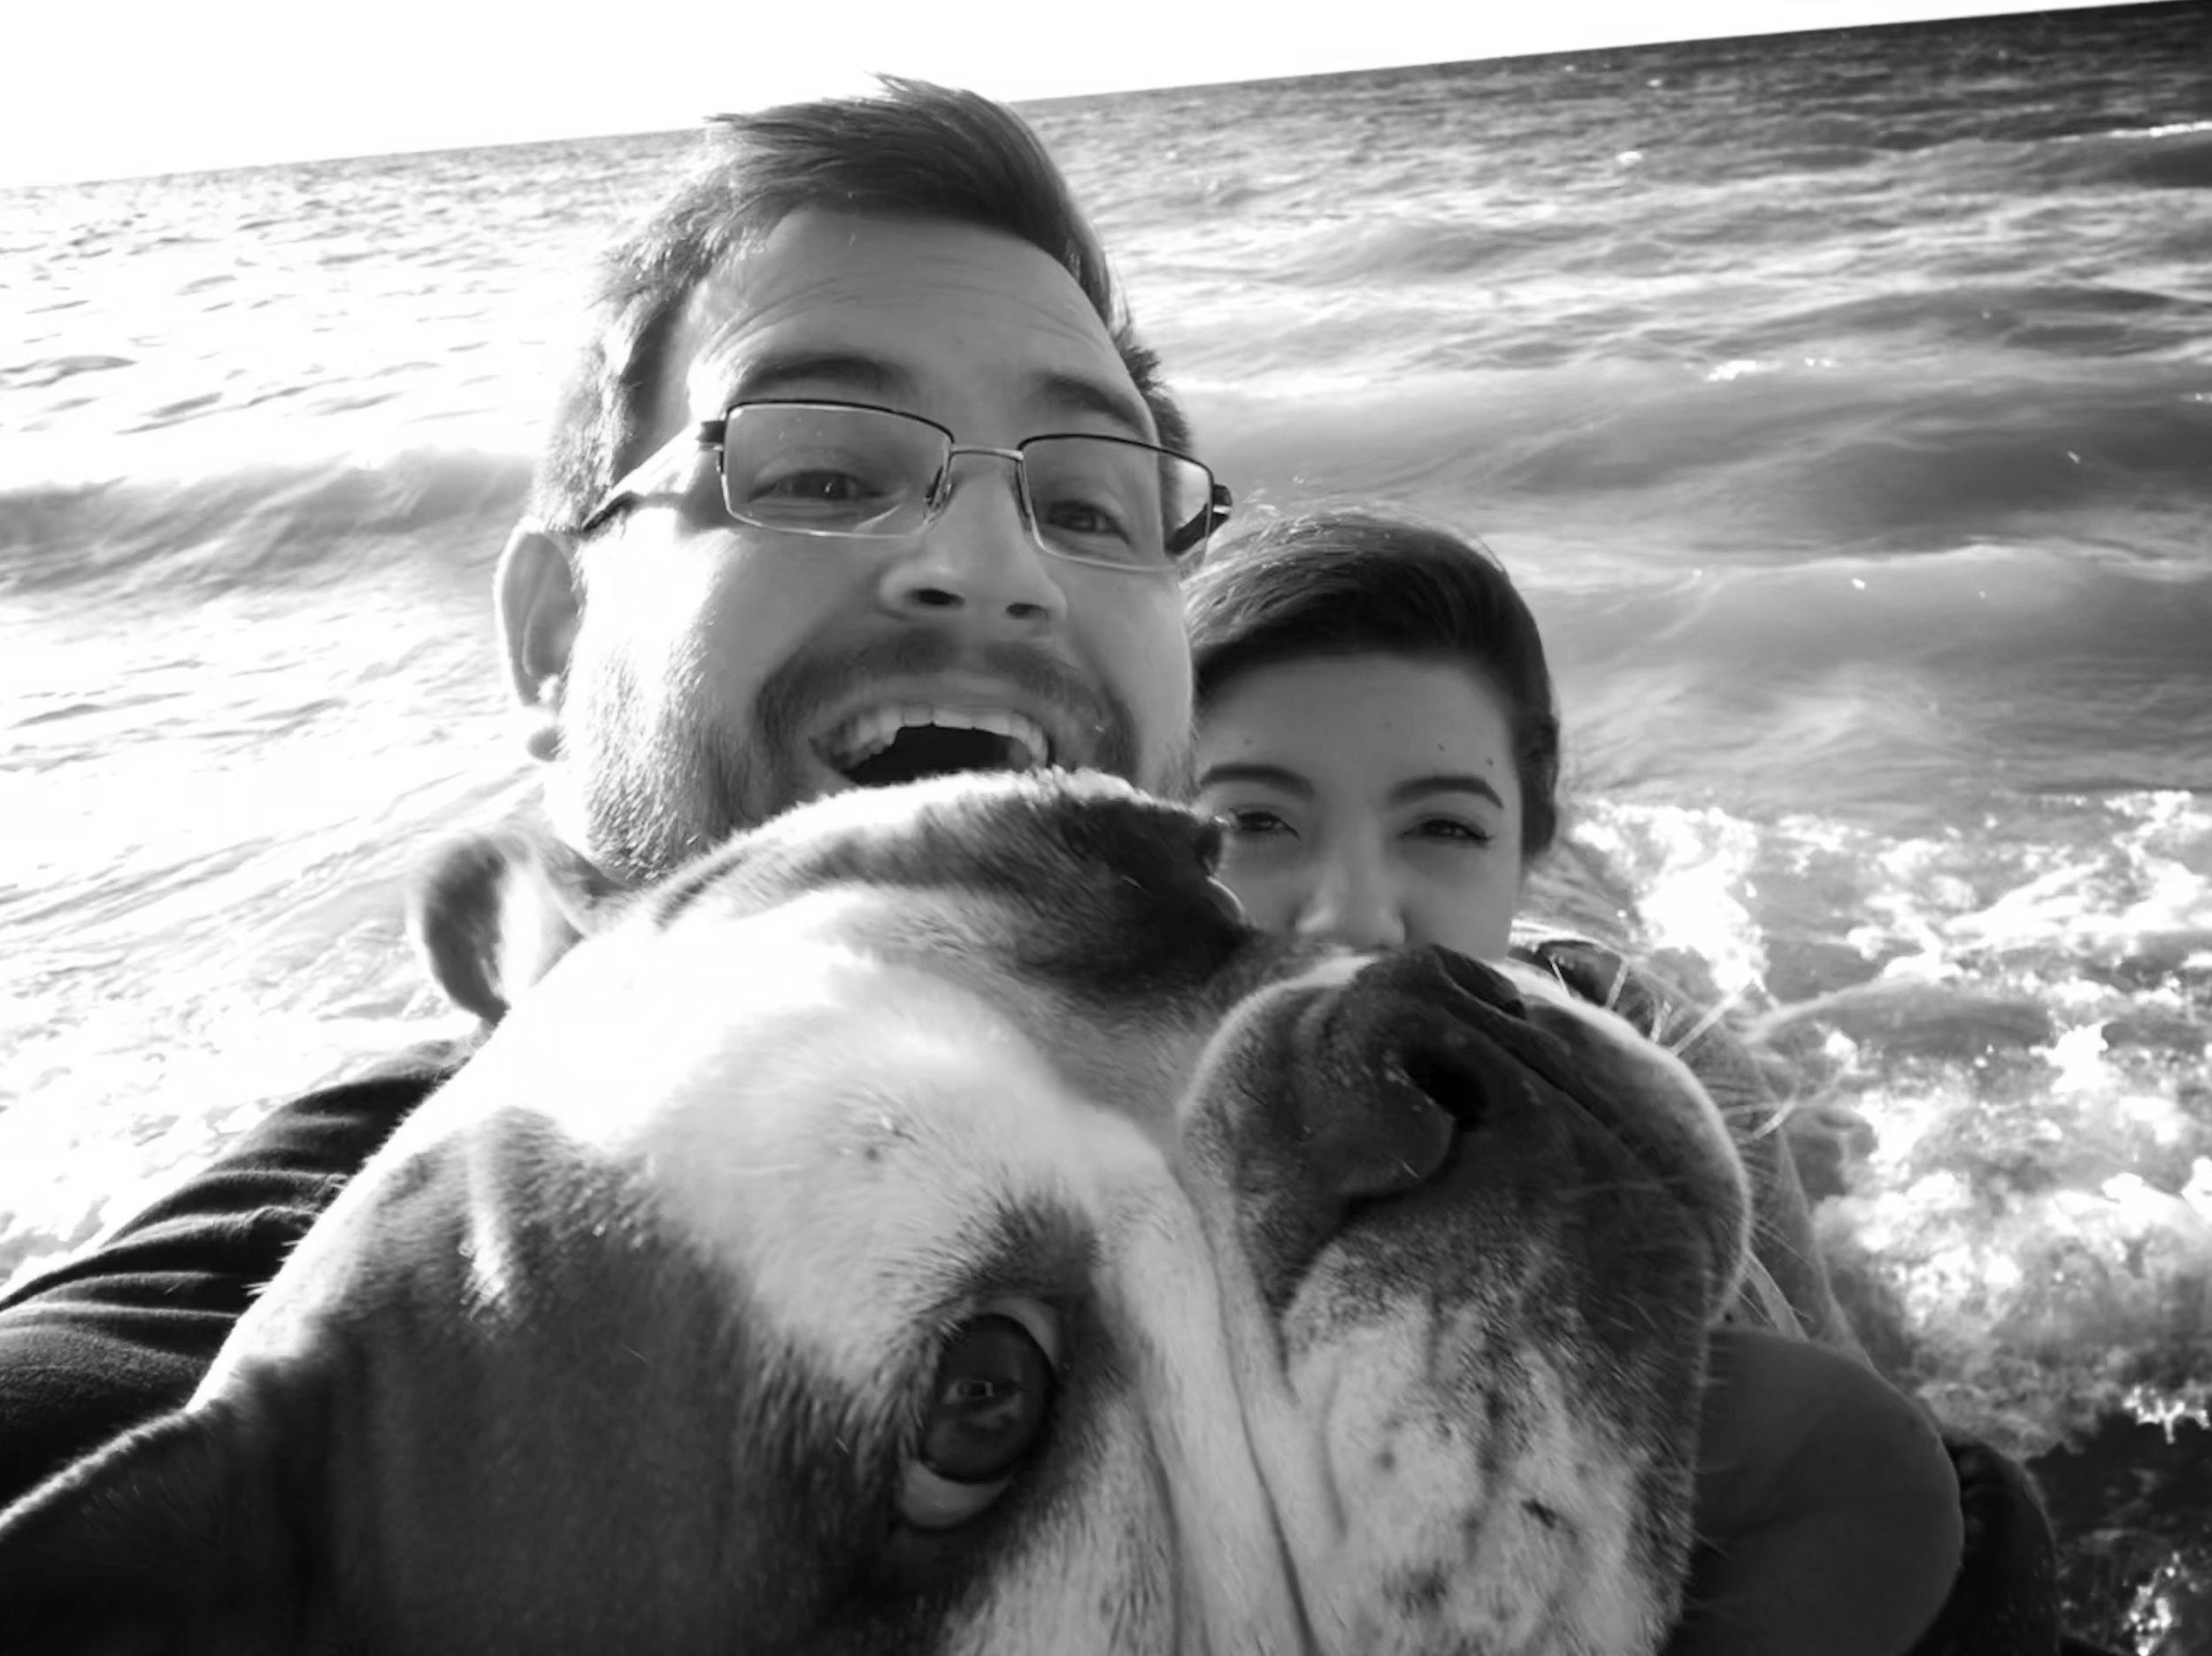 Lake Michigan, my girls and I.